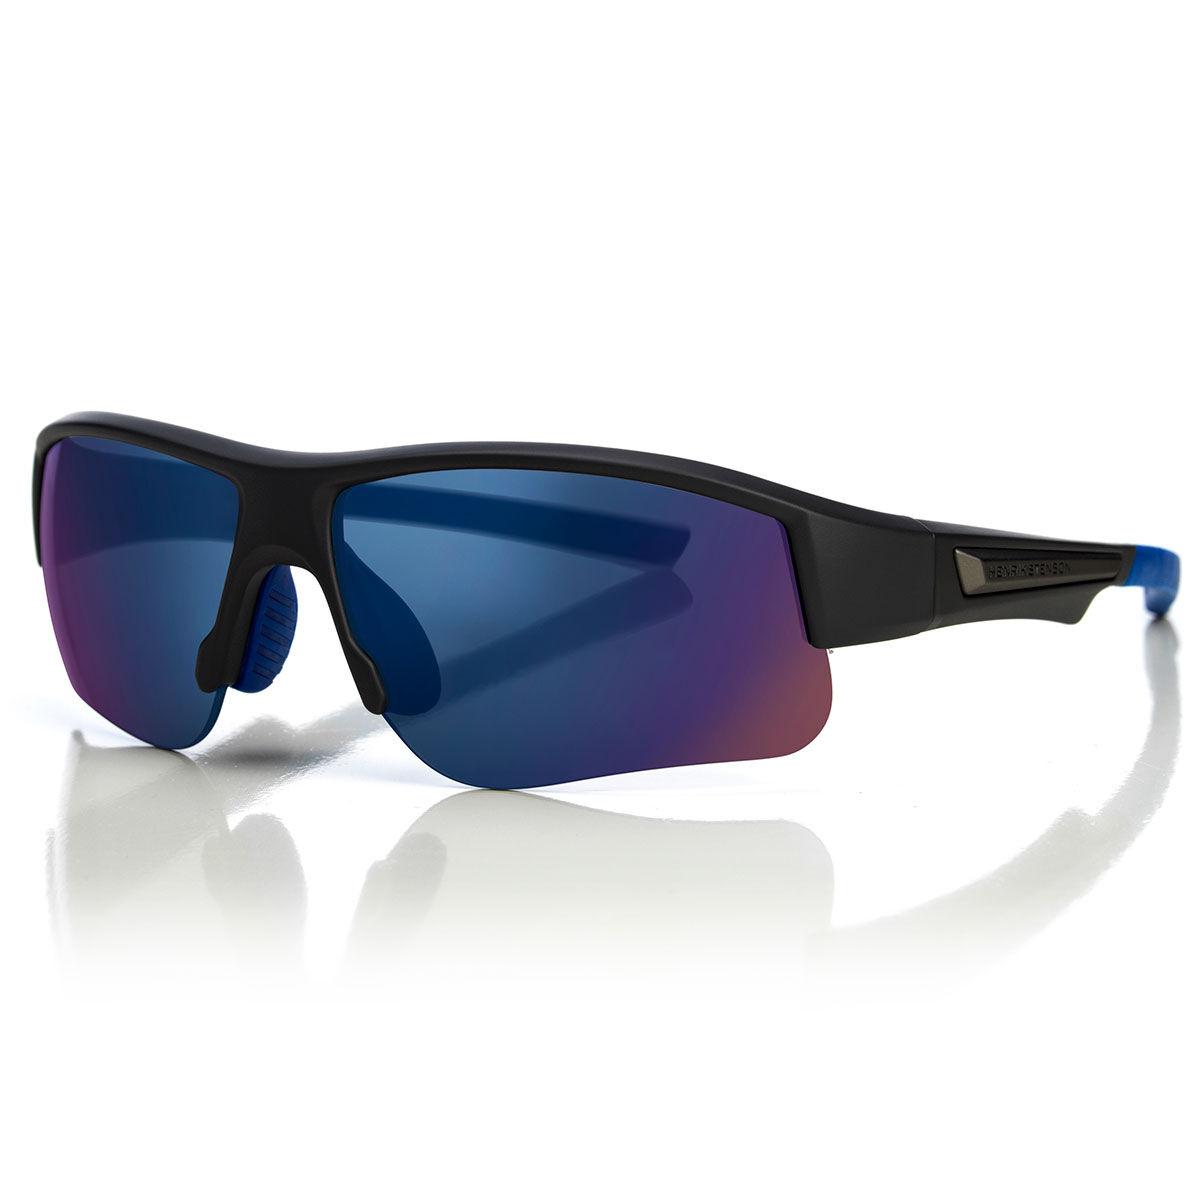 Henrik Stenson Stinger 3.0 Sunglasses, Mens, Grey/blue/smoke/blue mirror | American Golf